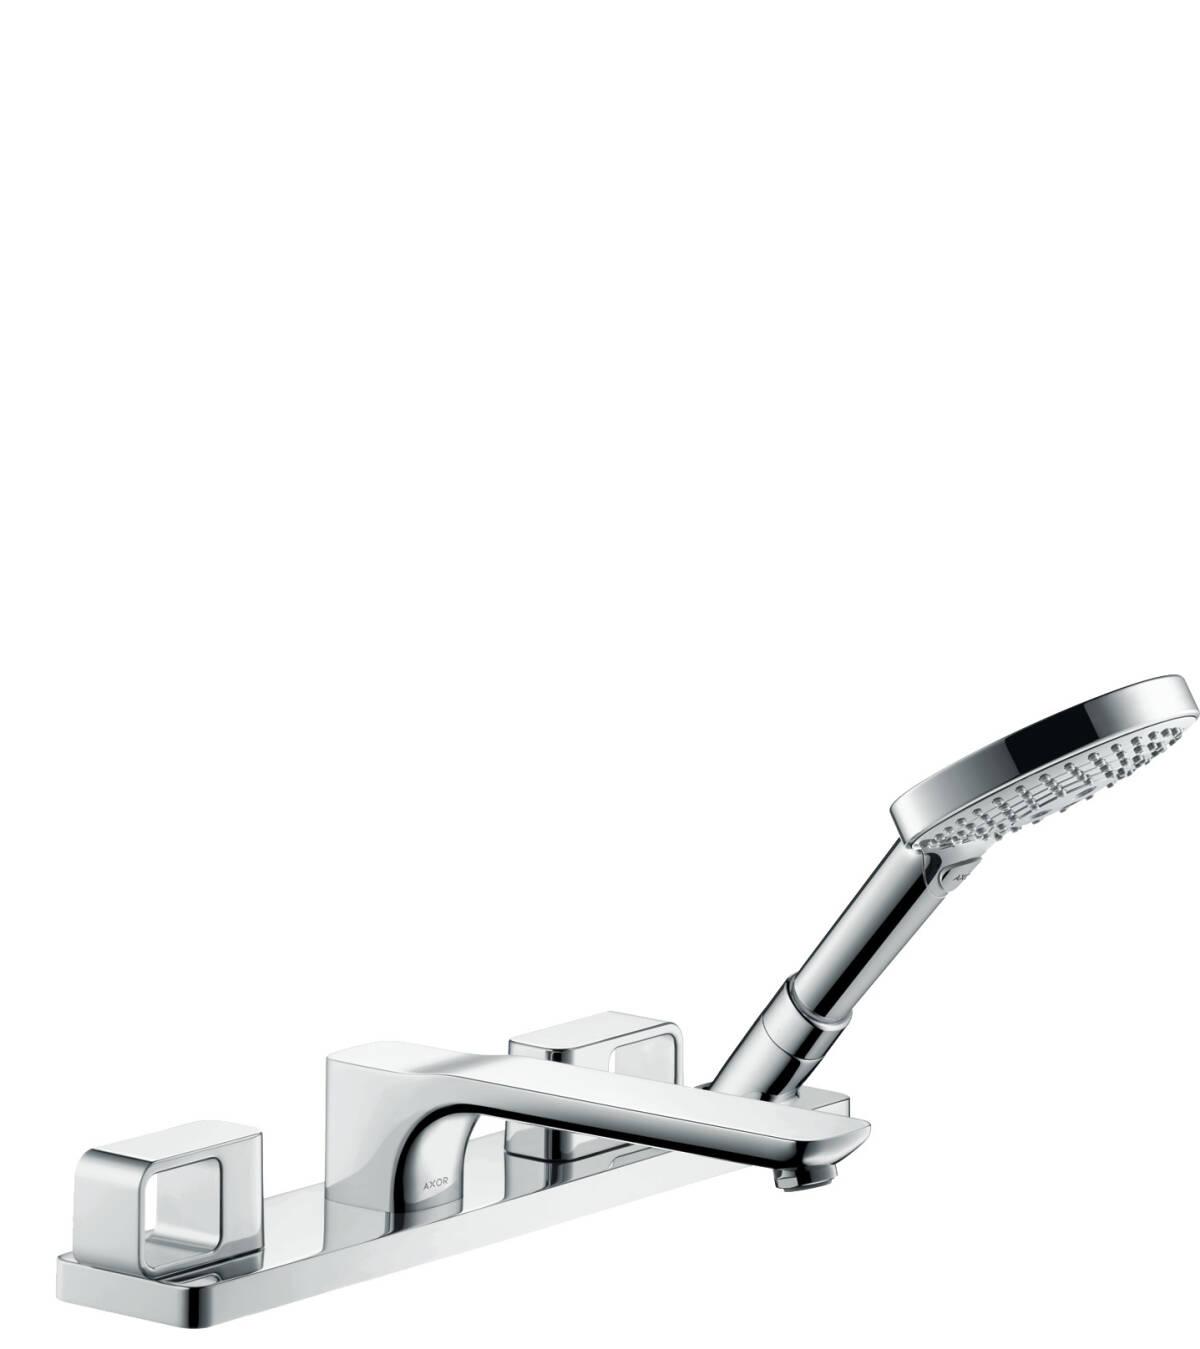 4-hole rim mounted bath mixer, Chrome, 11443000